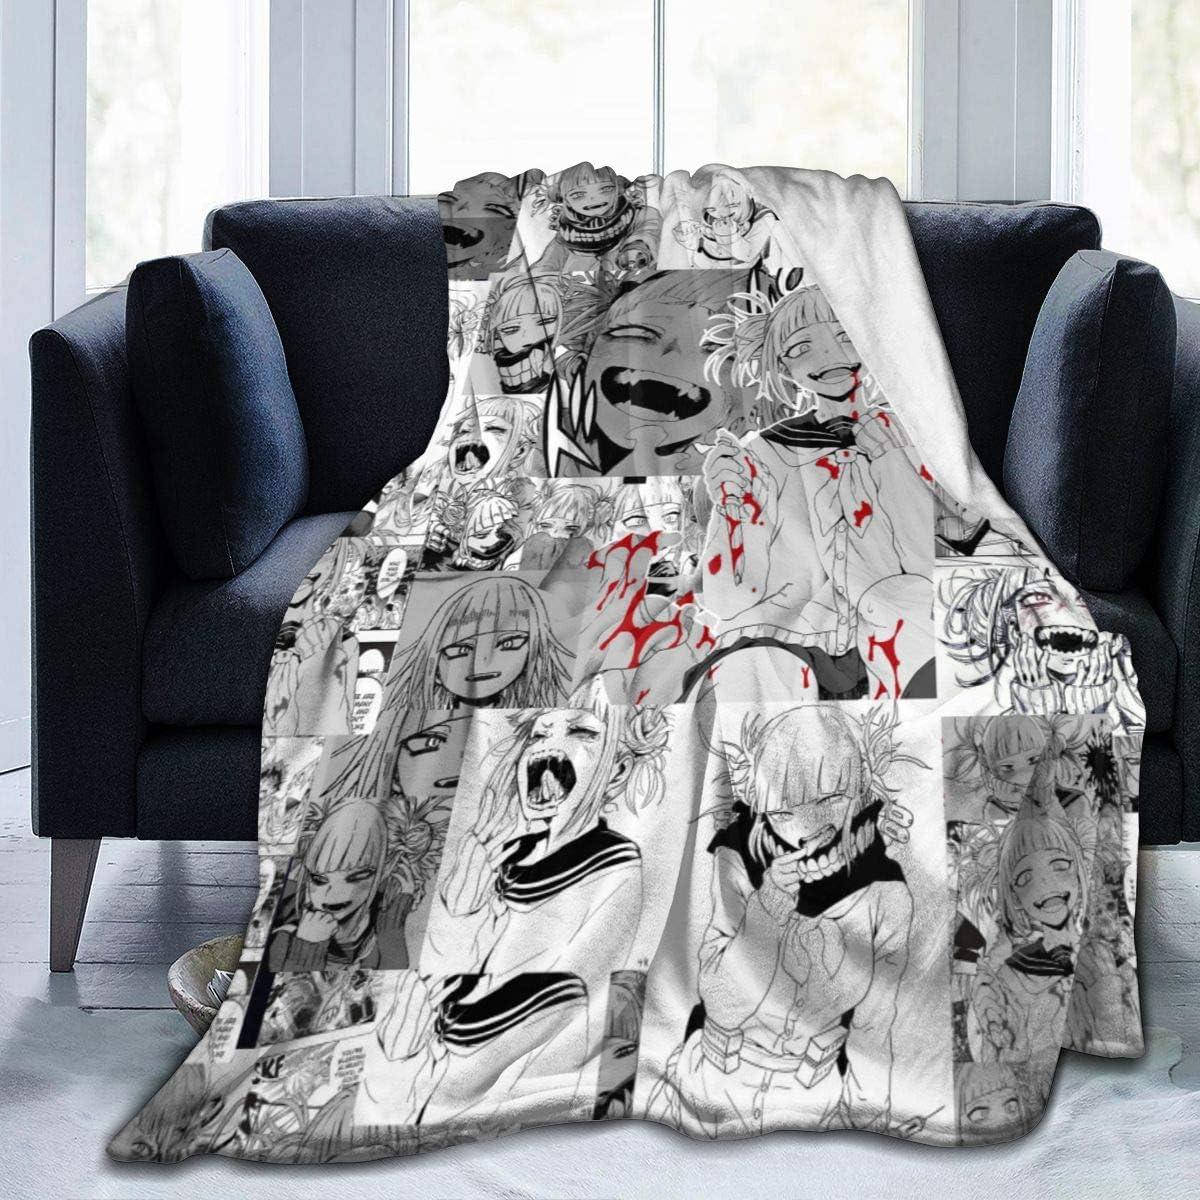 Marrh Himiko Toga Flannel Blanket Hypoallergenic Plus 日時指定 Soft Super SALE